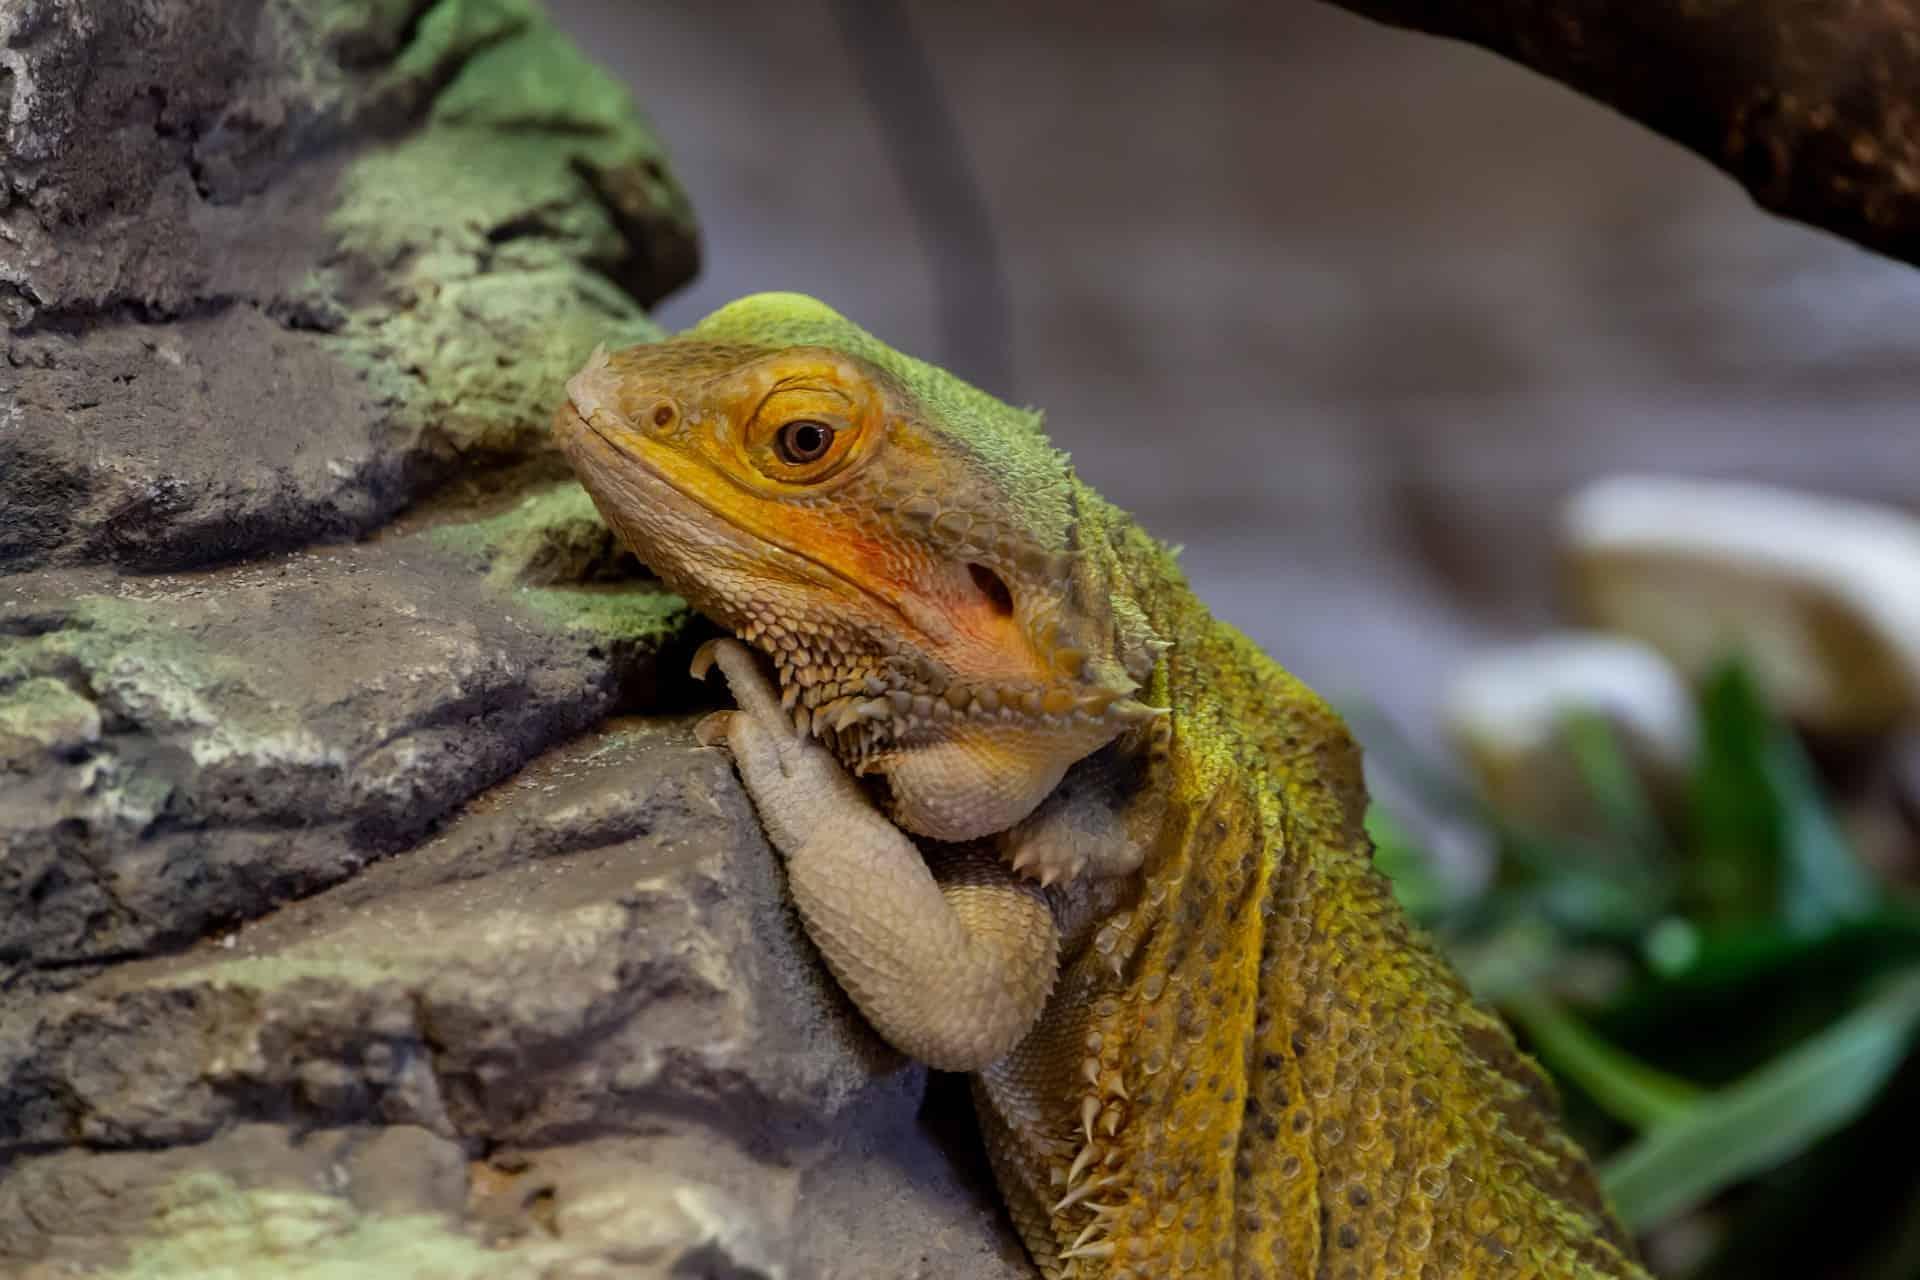 Australian bearded dragon climbing a rock